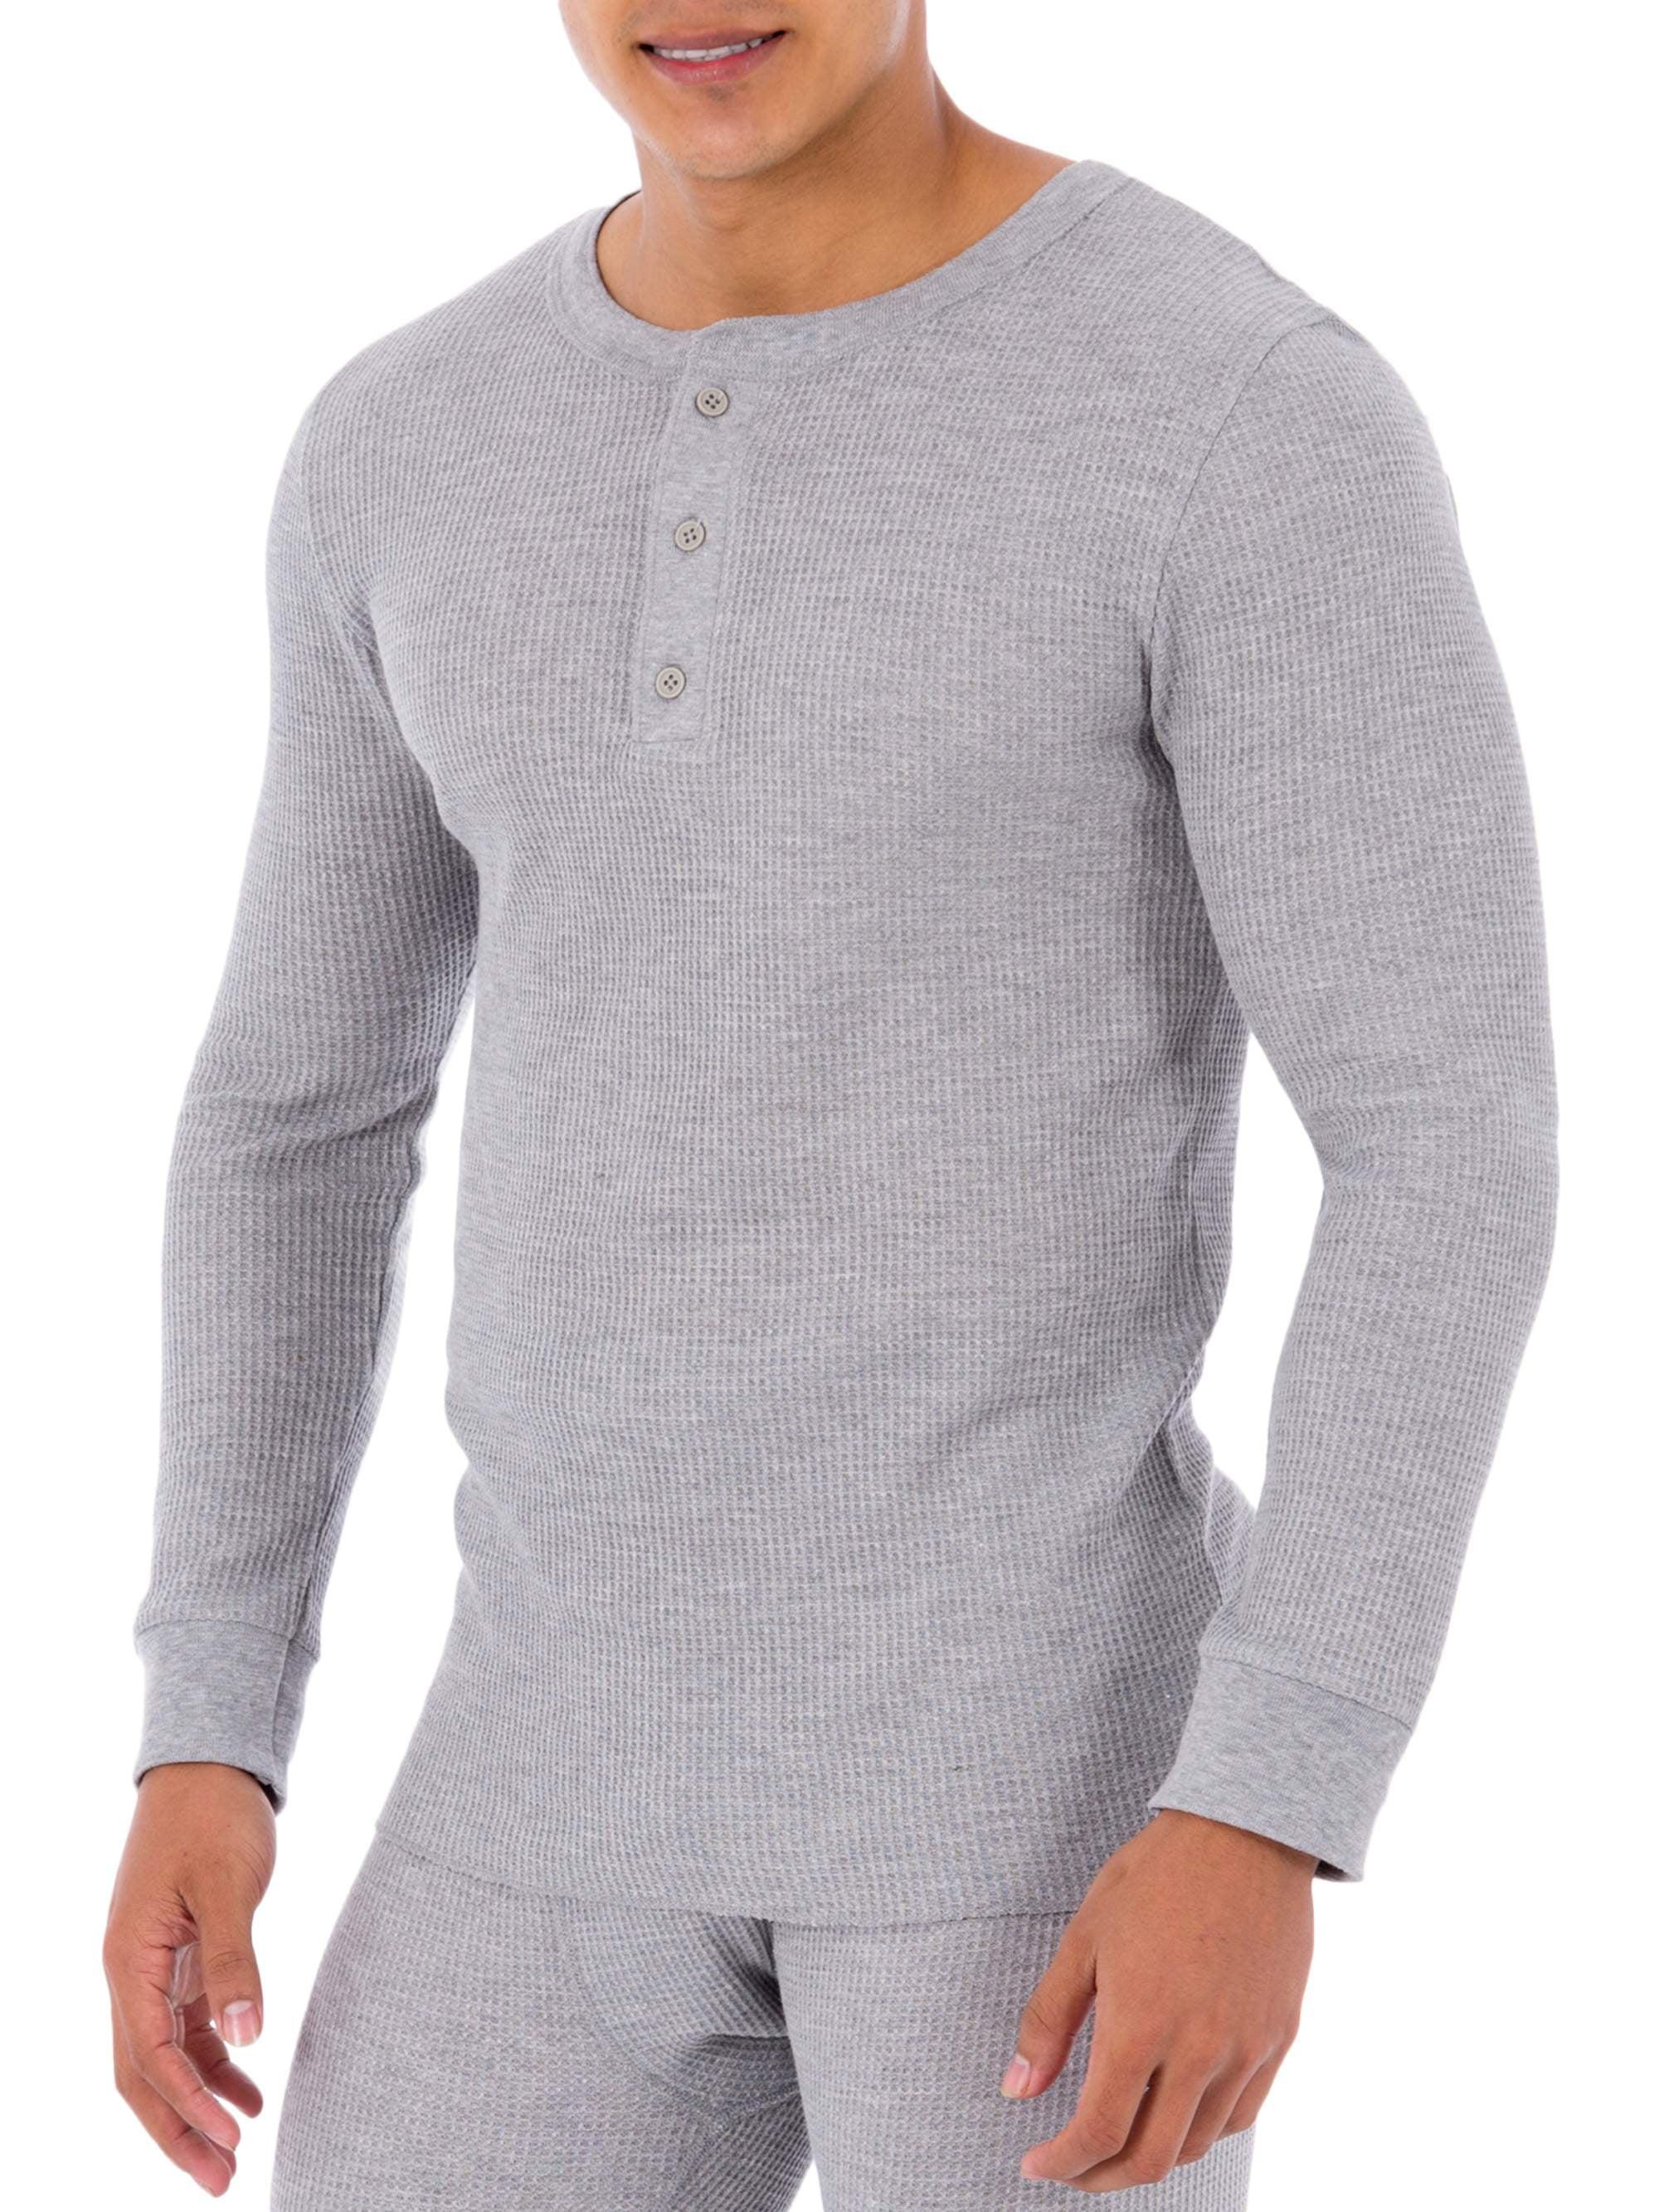 American Apparel Mens Waffle Thermal Henley Long Sleeve T-Shirt